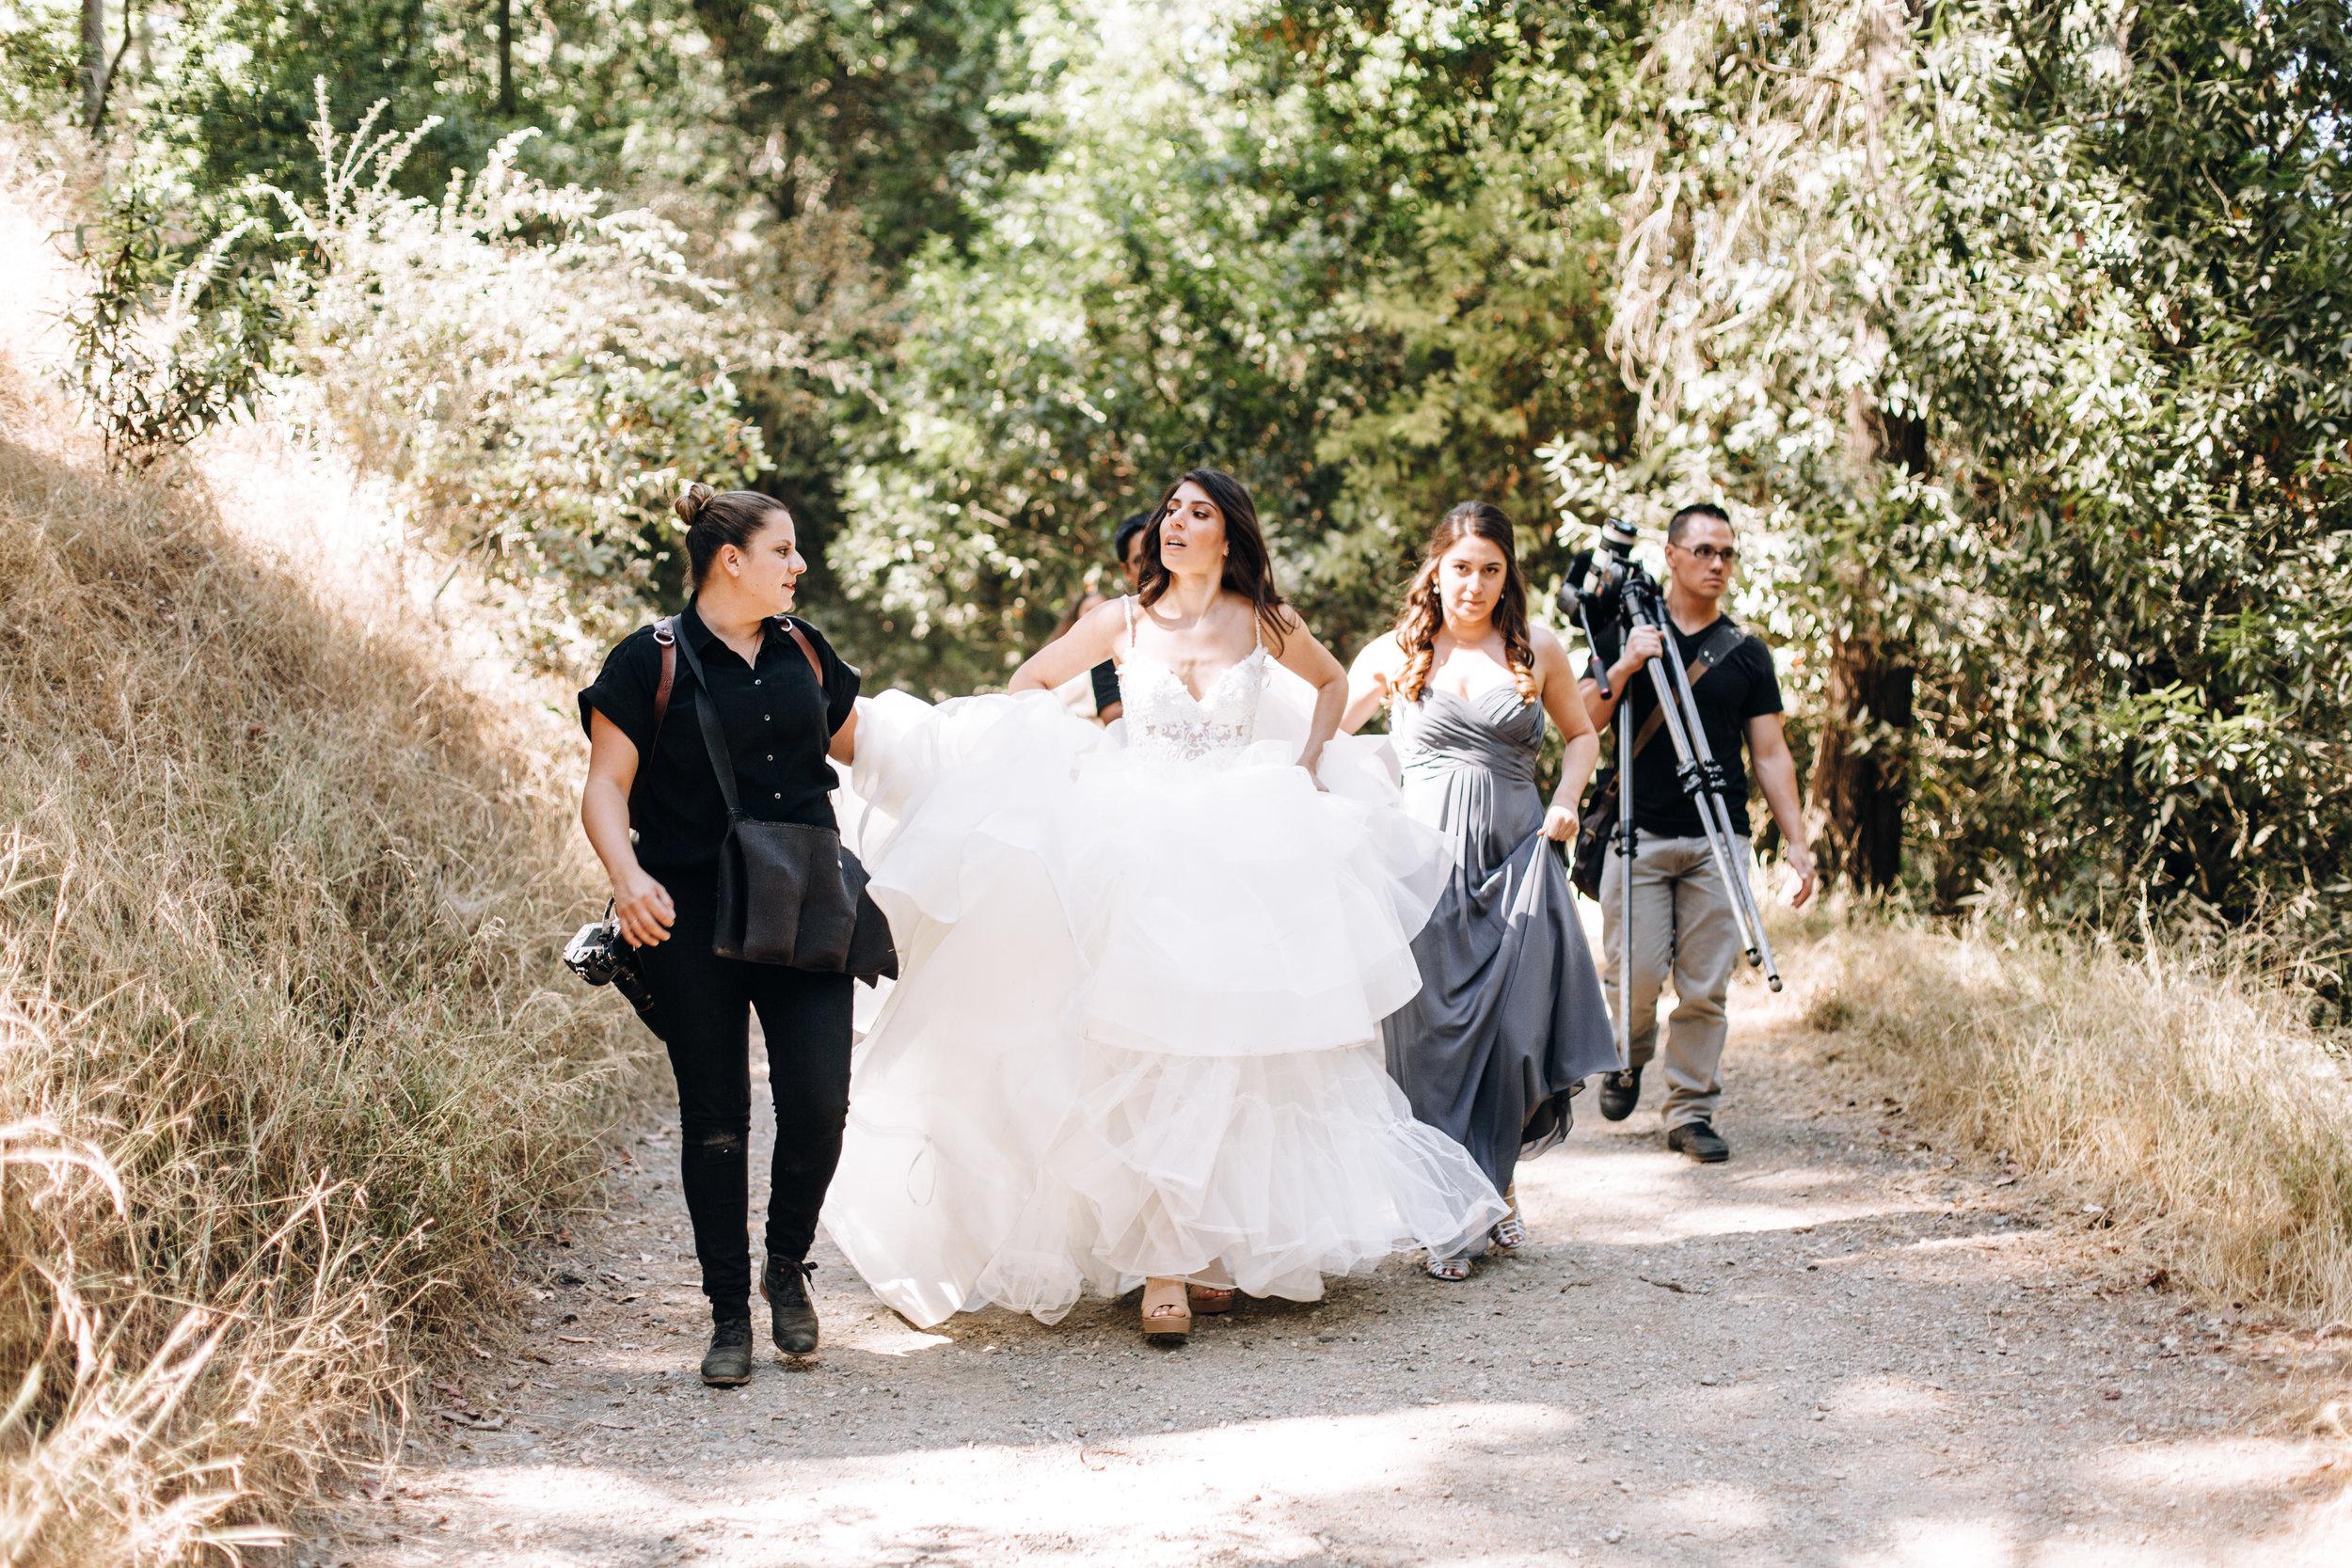 KaraNixonWeddings-GreekOrthodox-Oakland-Wedding-19.jpg